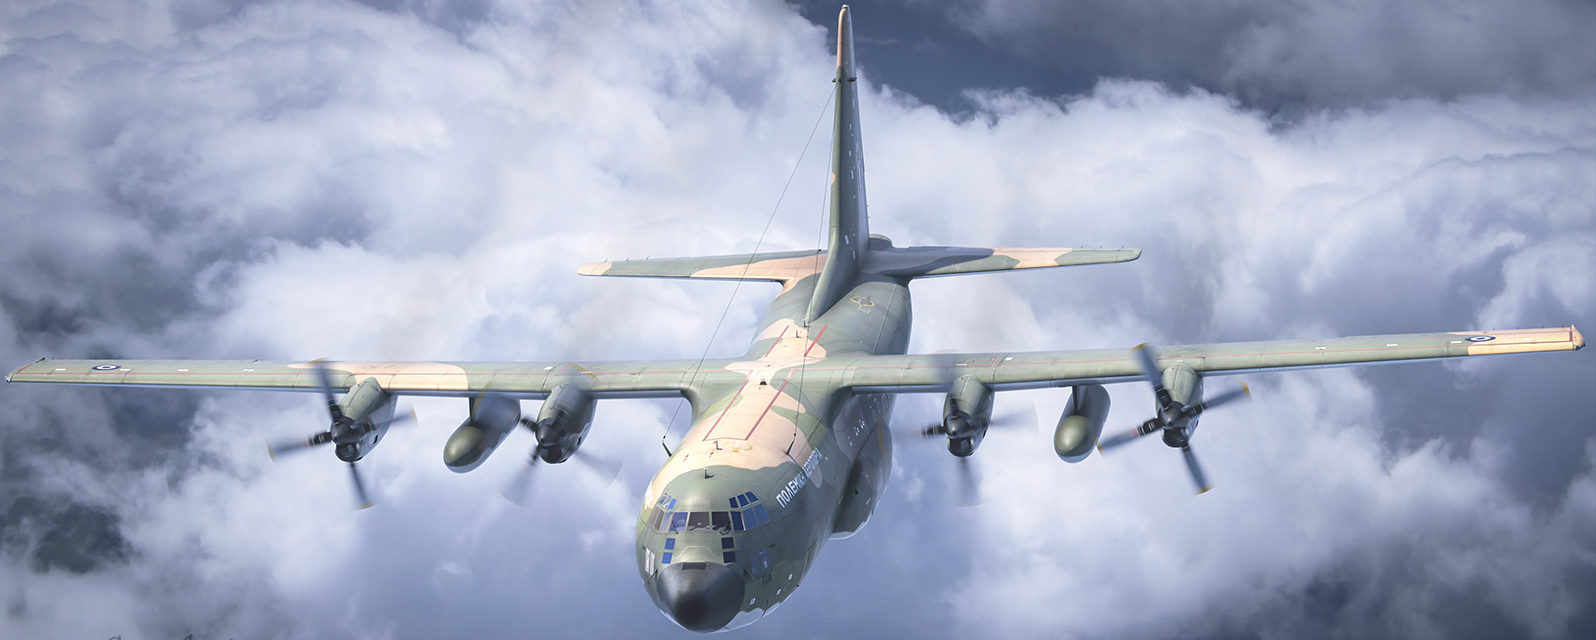 Karidis Antonis. Бомбардировщик C-130 Hercules.